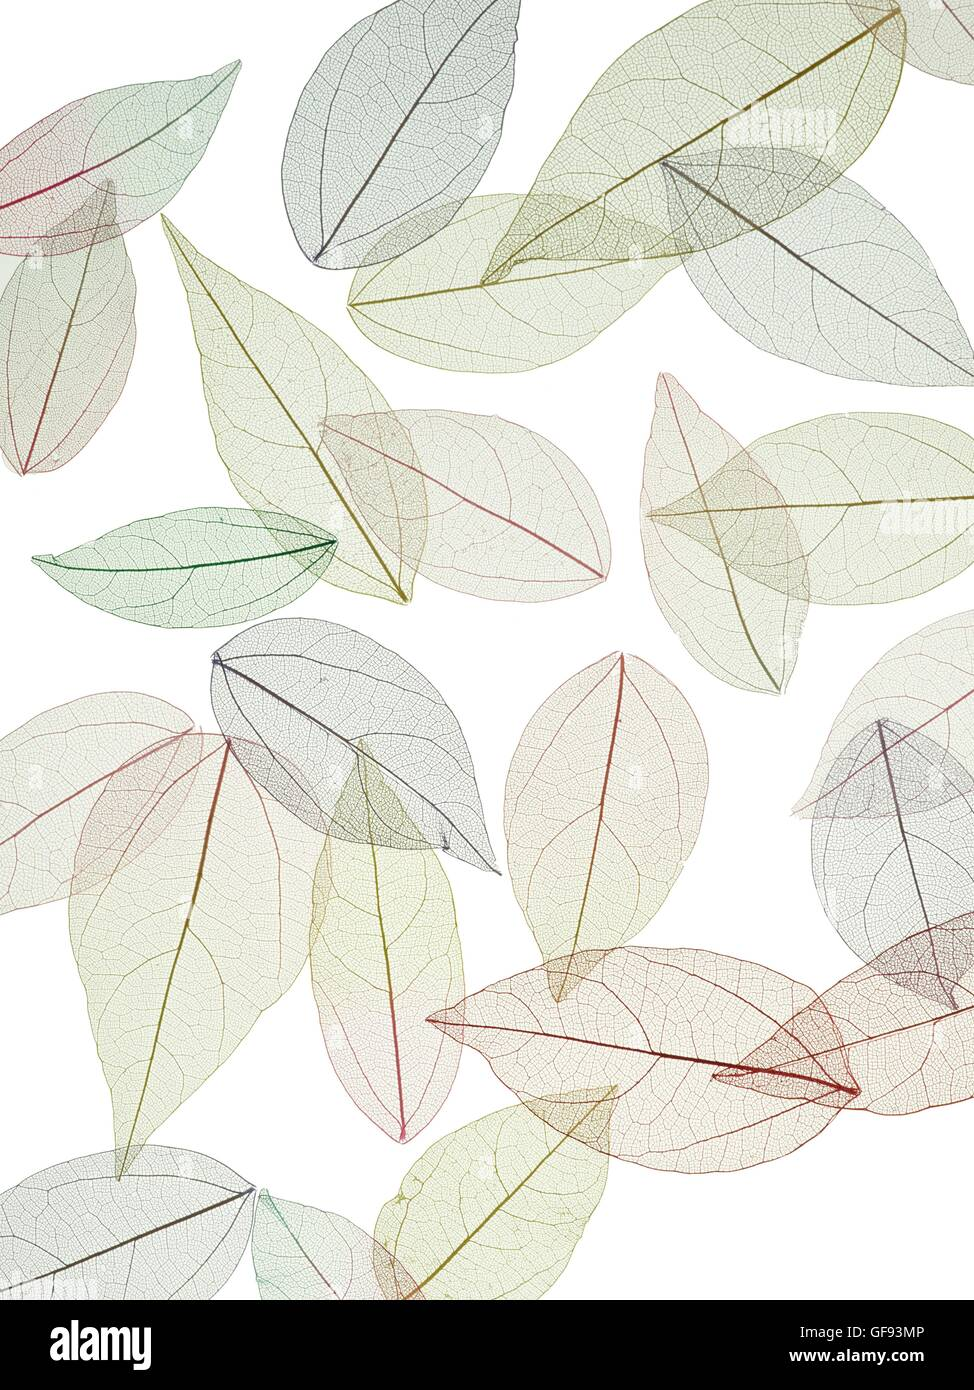 Leaf skeletons of rubber tree (Hevea brasiliensis) leaves, studio shot. - Stock Image